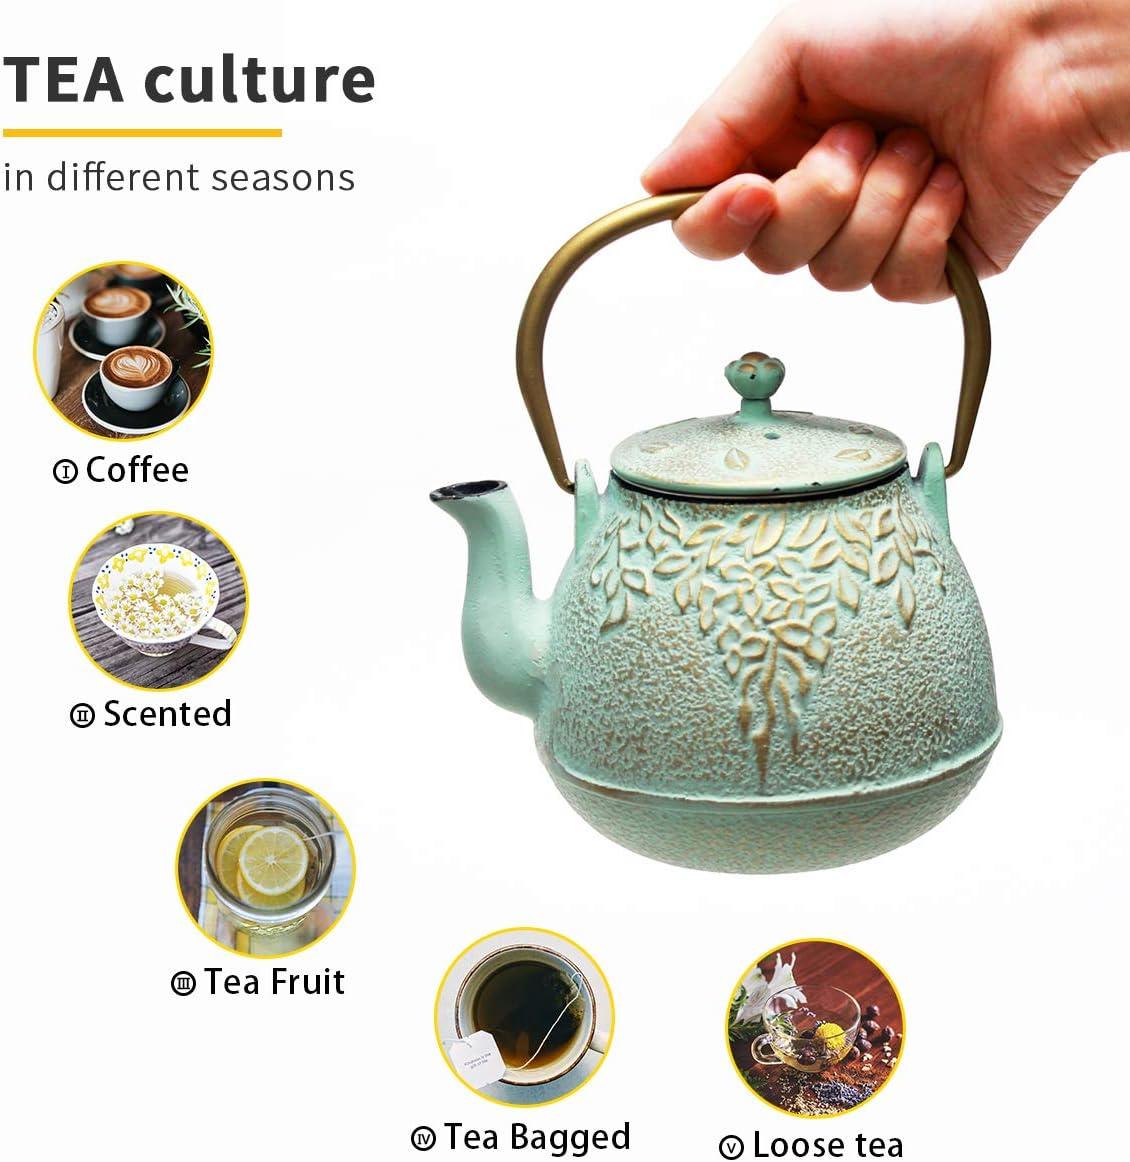 Tea Kettle, TOPTIER Japanese Cast Iron Teapot with Stainless Steel Infuser, Cast Iron Tea Kettle Stovetop Safe